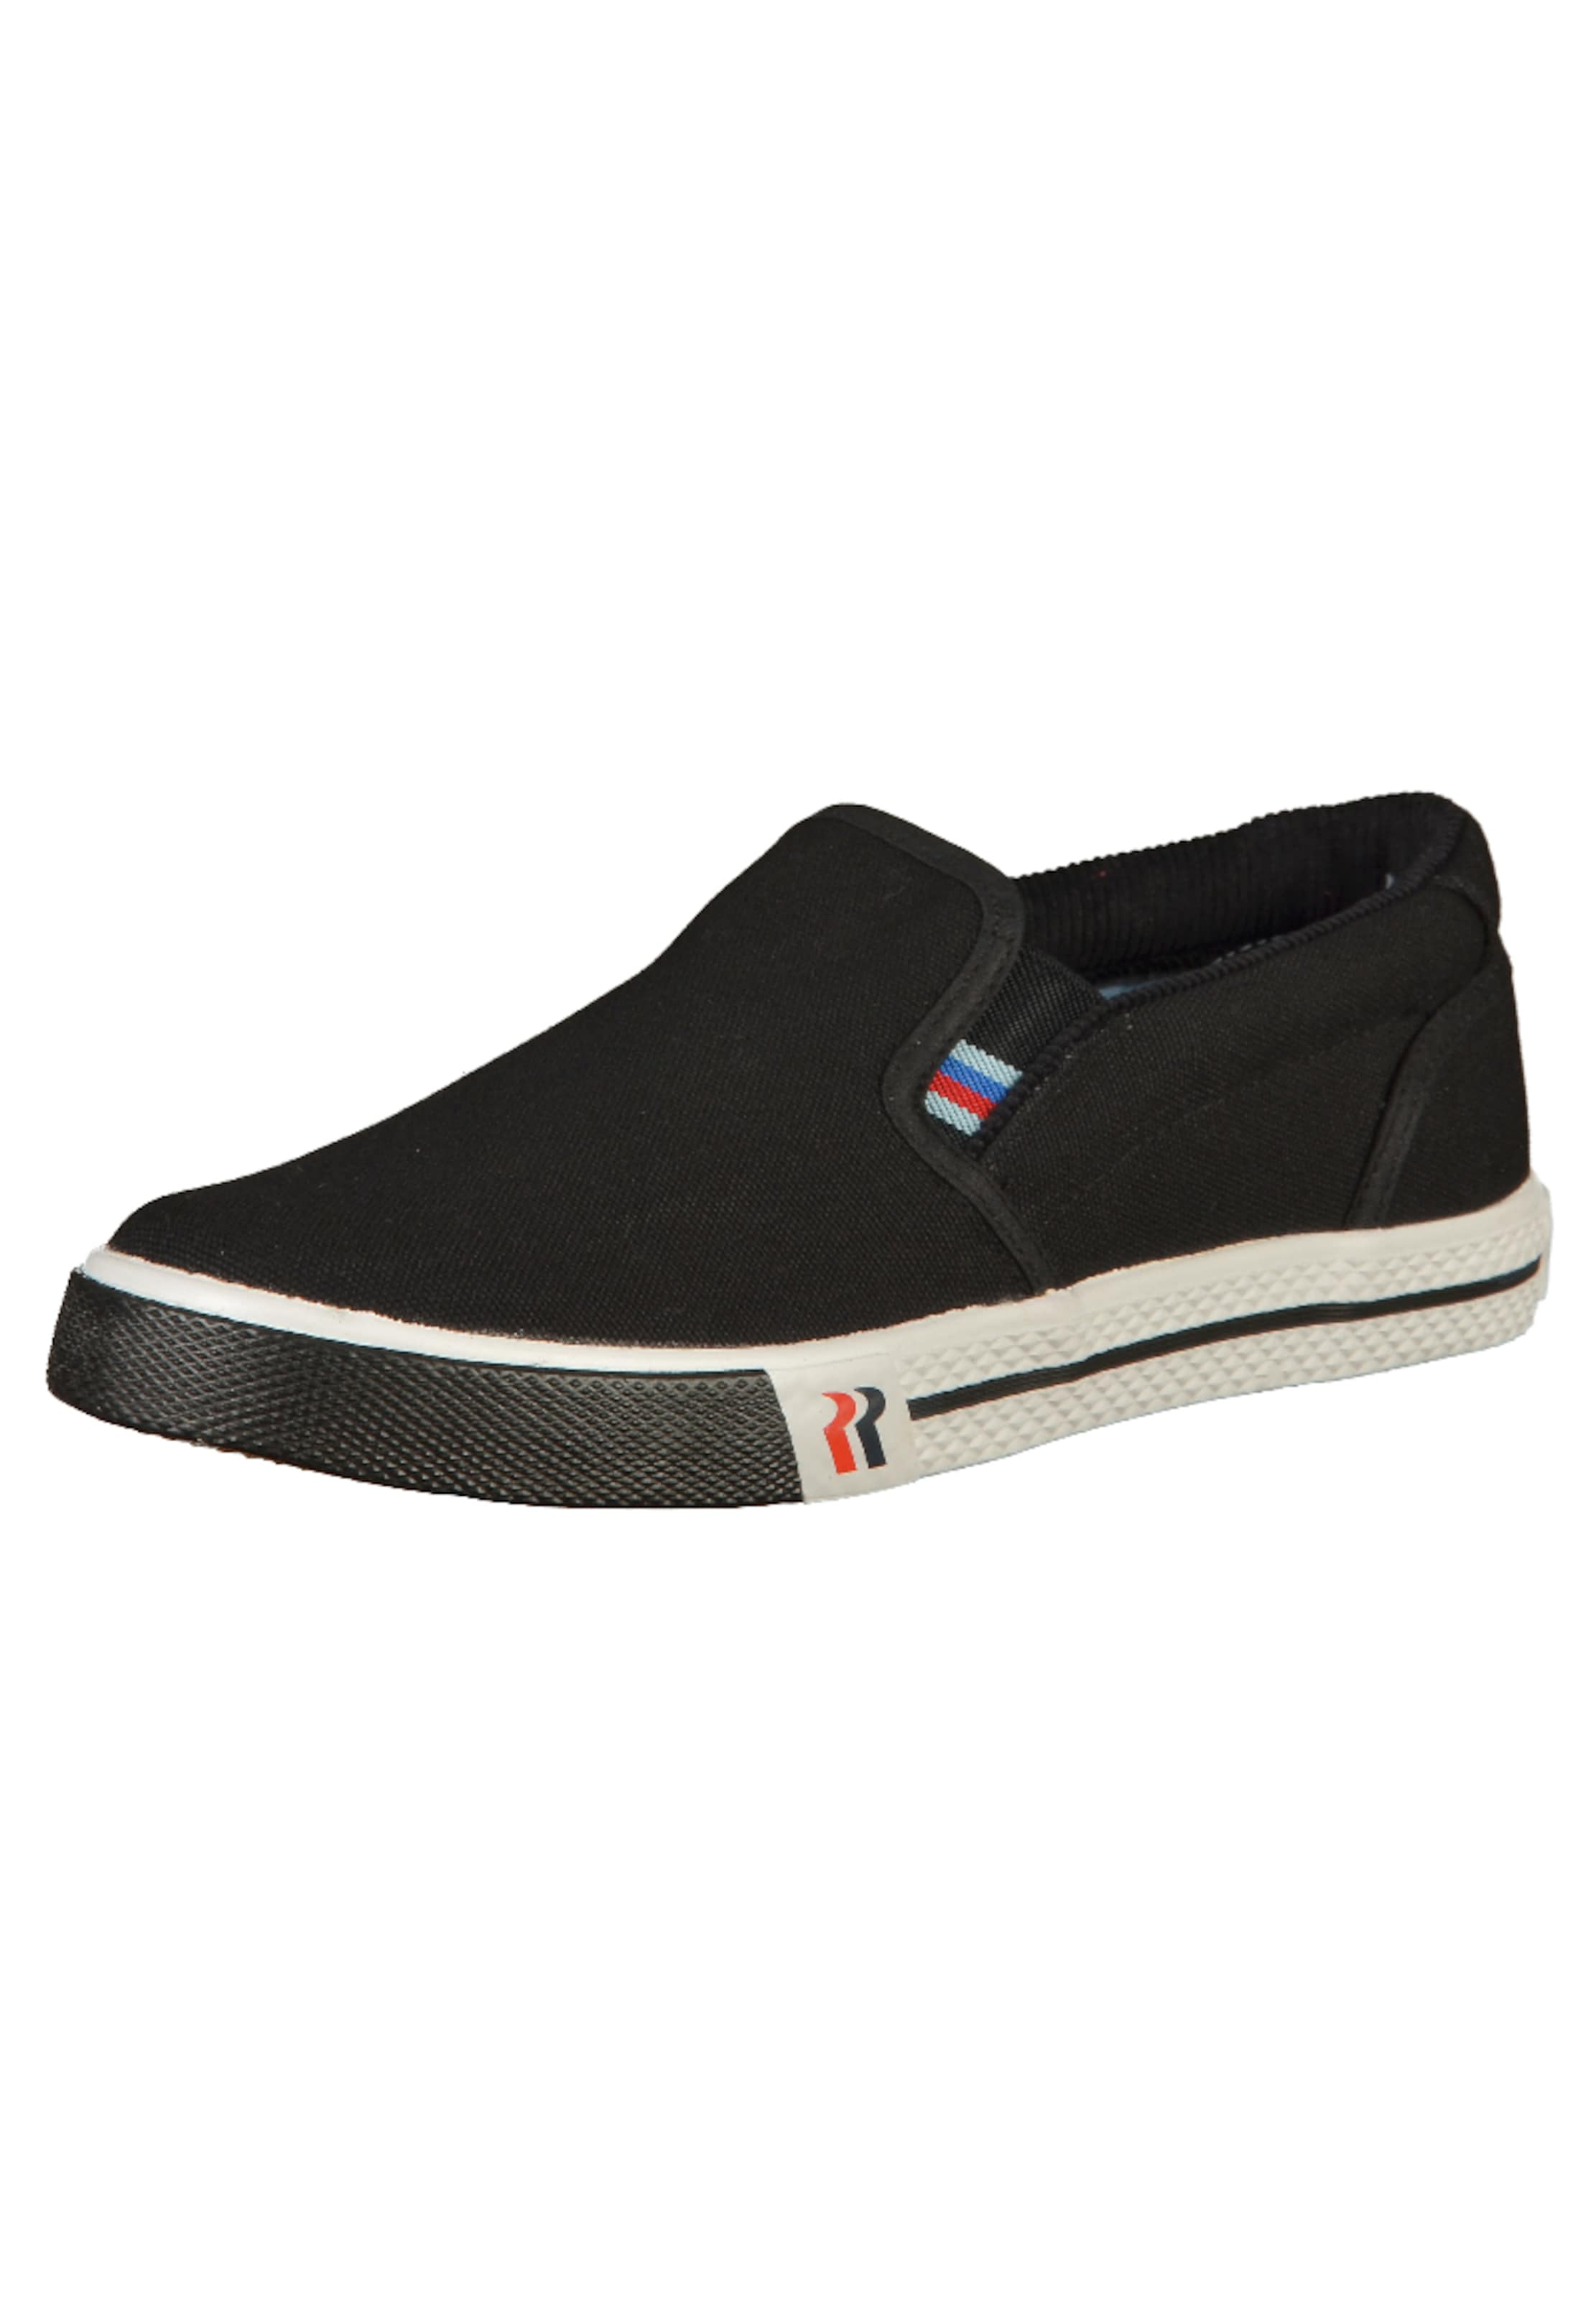 Haltbare Mode billige Schuhe ROMIKA | Slipper Schuhe Gut getragene Schuhe